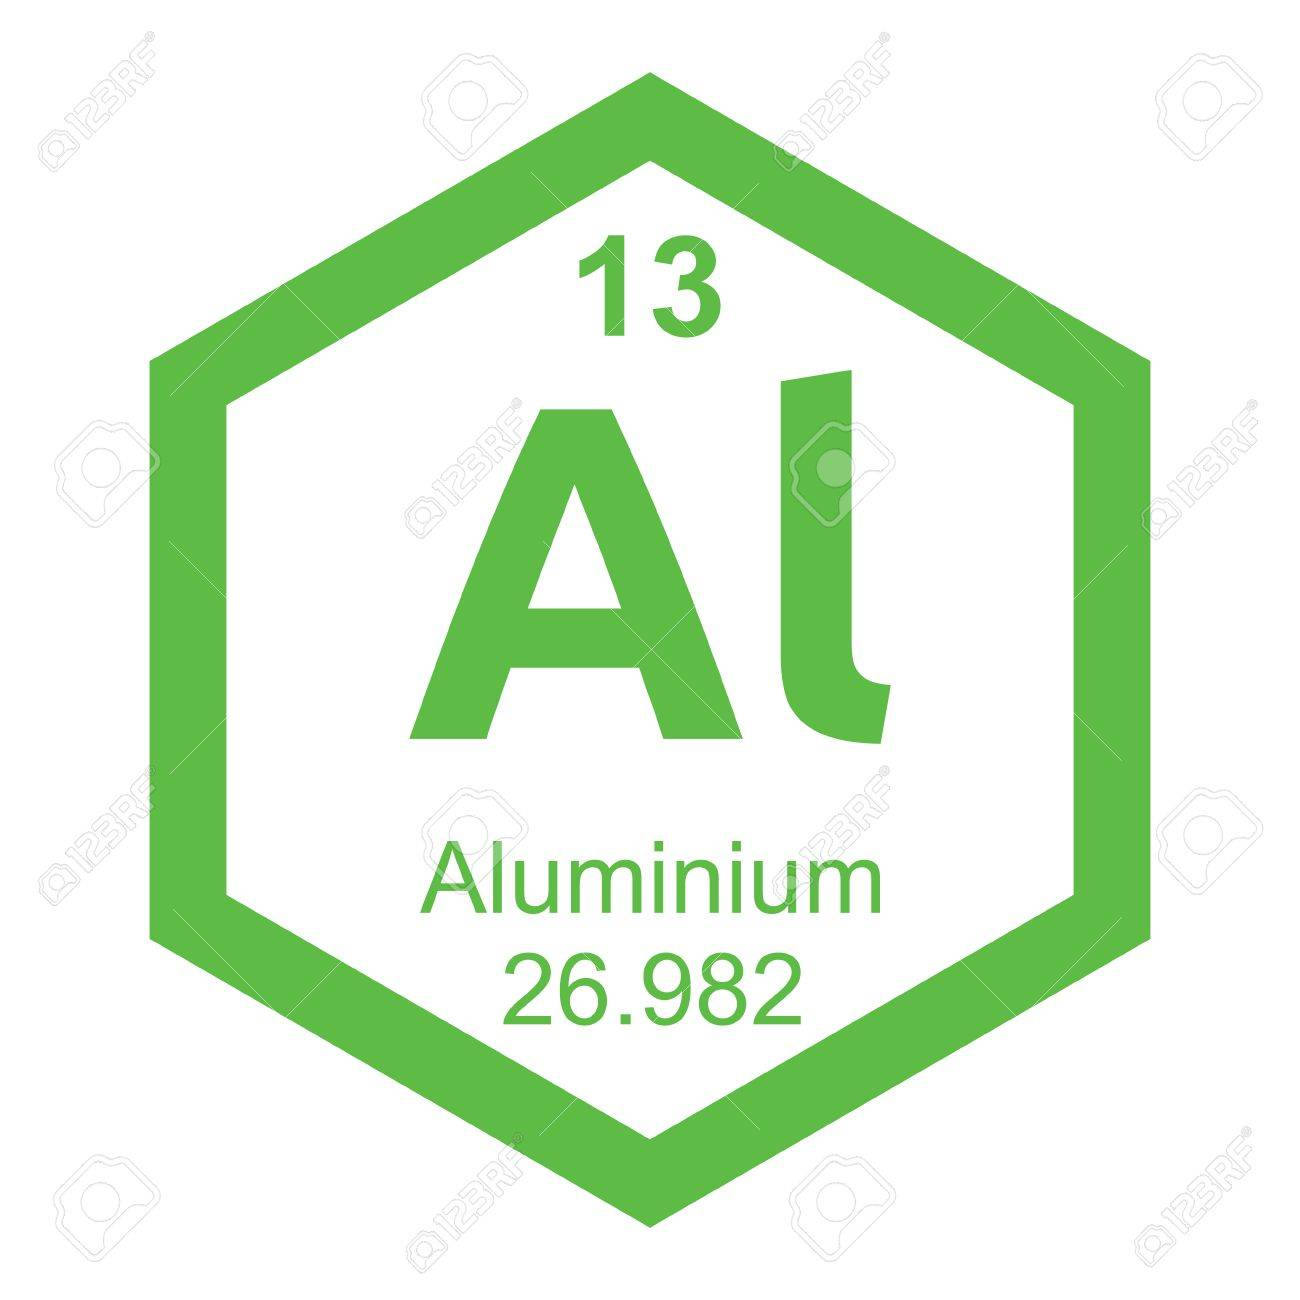 Periodic table aluminium royalty free cliparts vectors and stock periodic table aluminium stock vector 41261534 gamestrikefo Gallery